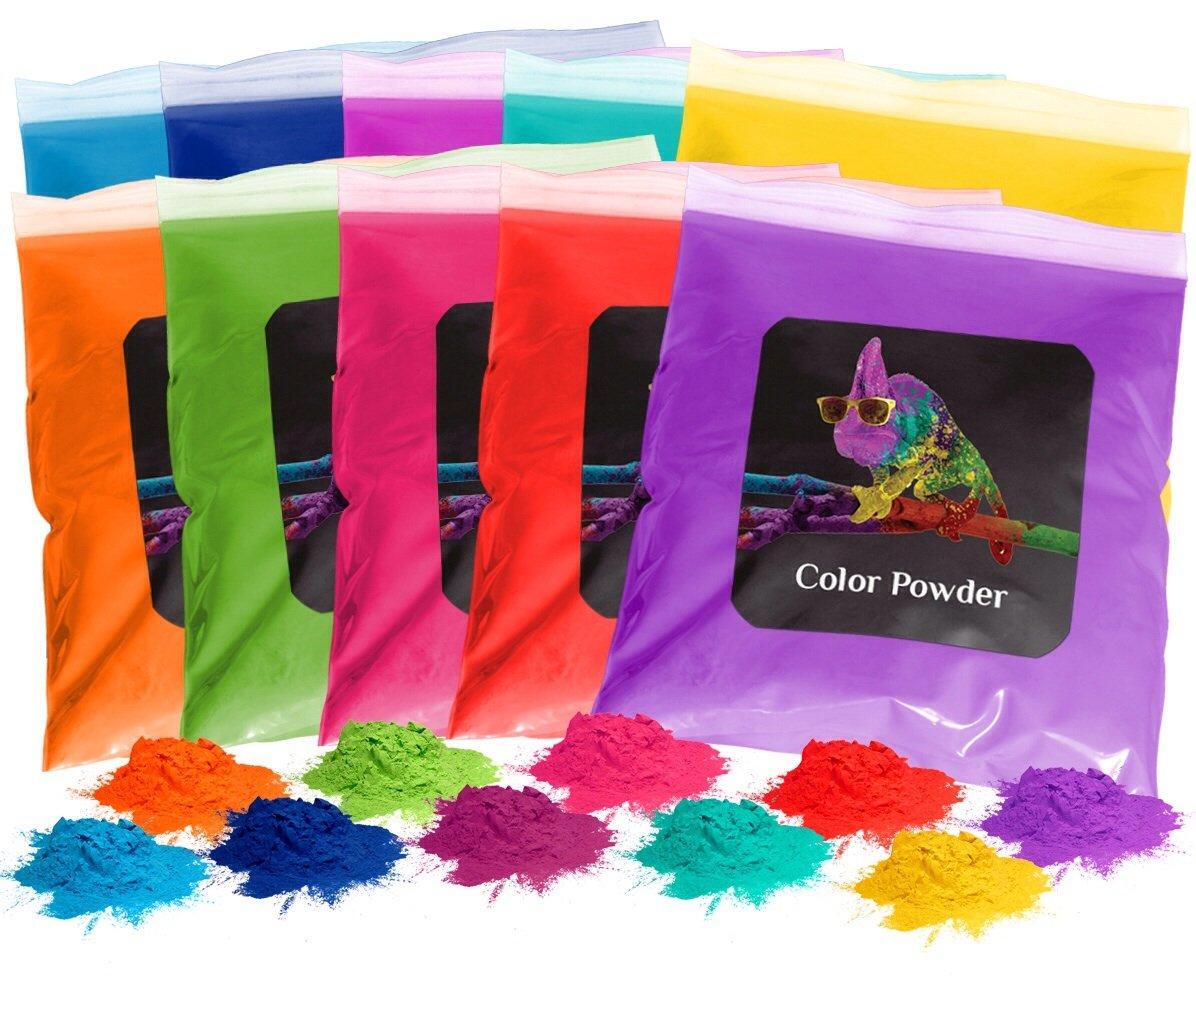 Holi Color Powder 10pk 1lb. Each Red, Yellow, Navy Blue, Green, Orange, Purple, Pink, Magenta, True Blue, Aquamarine